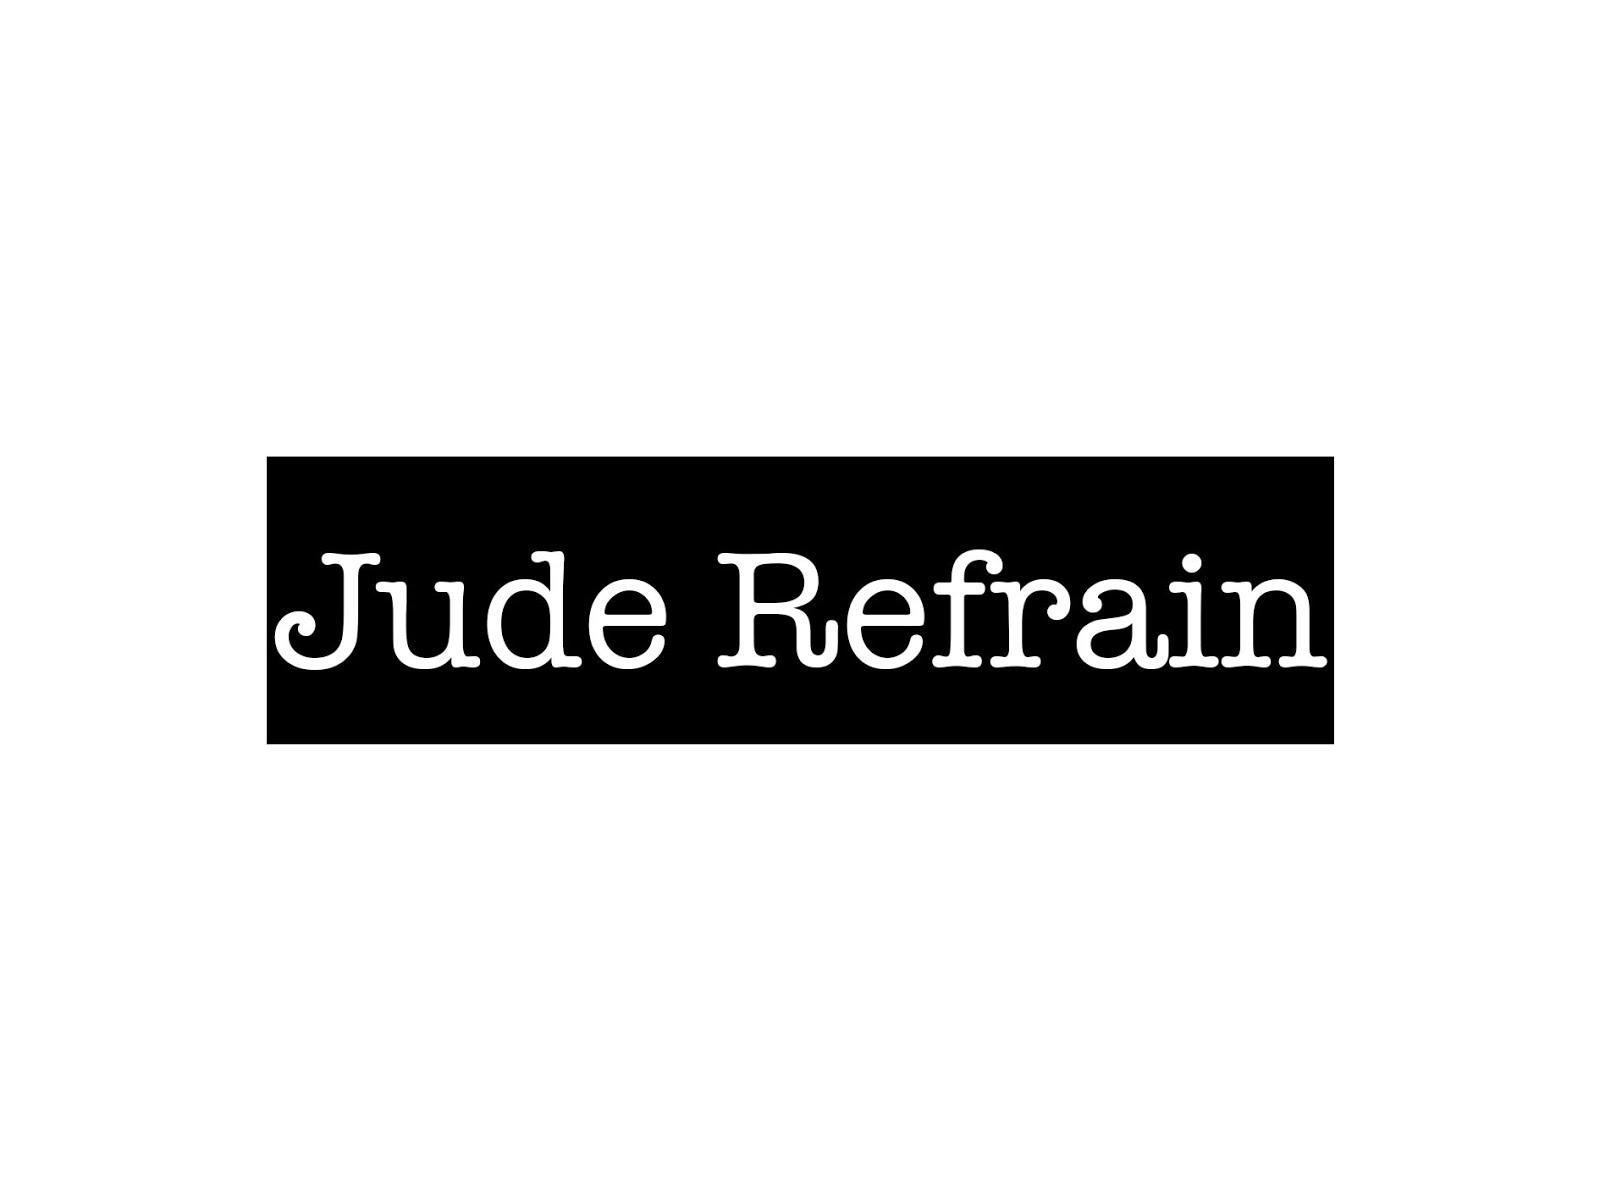 Jude Refrain